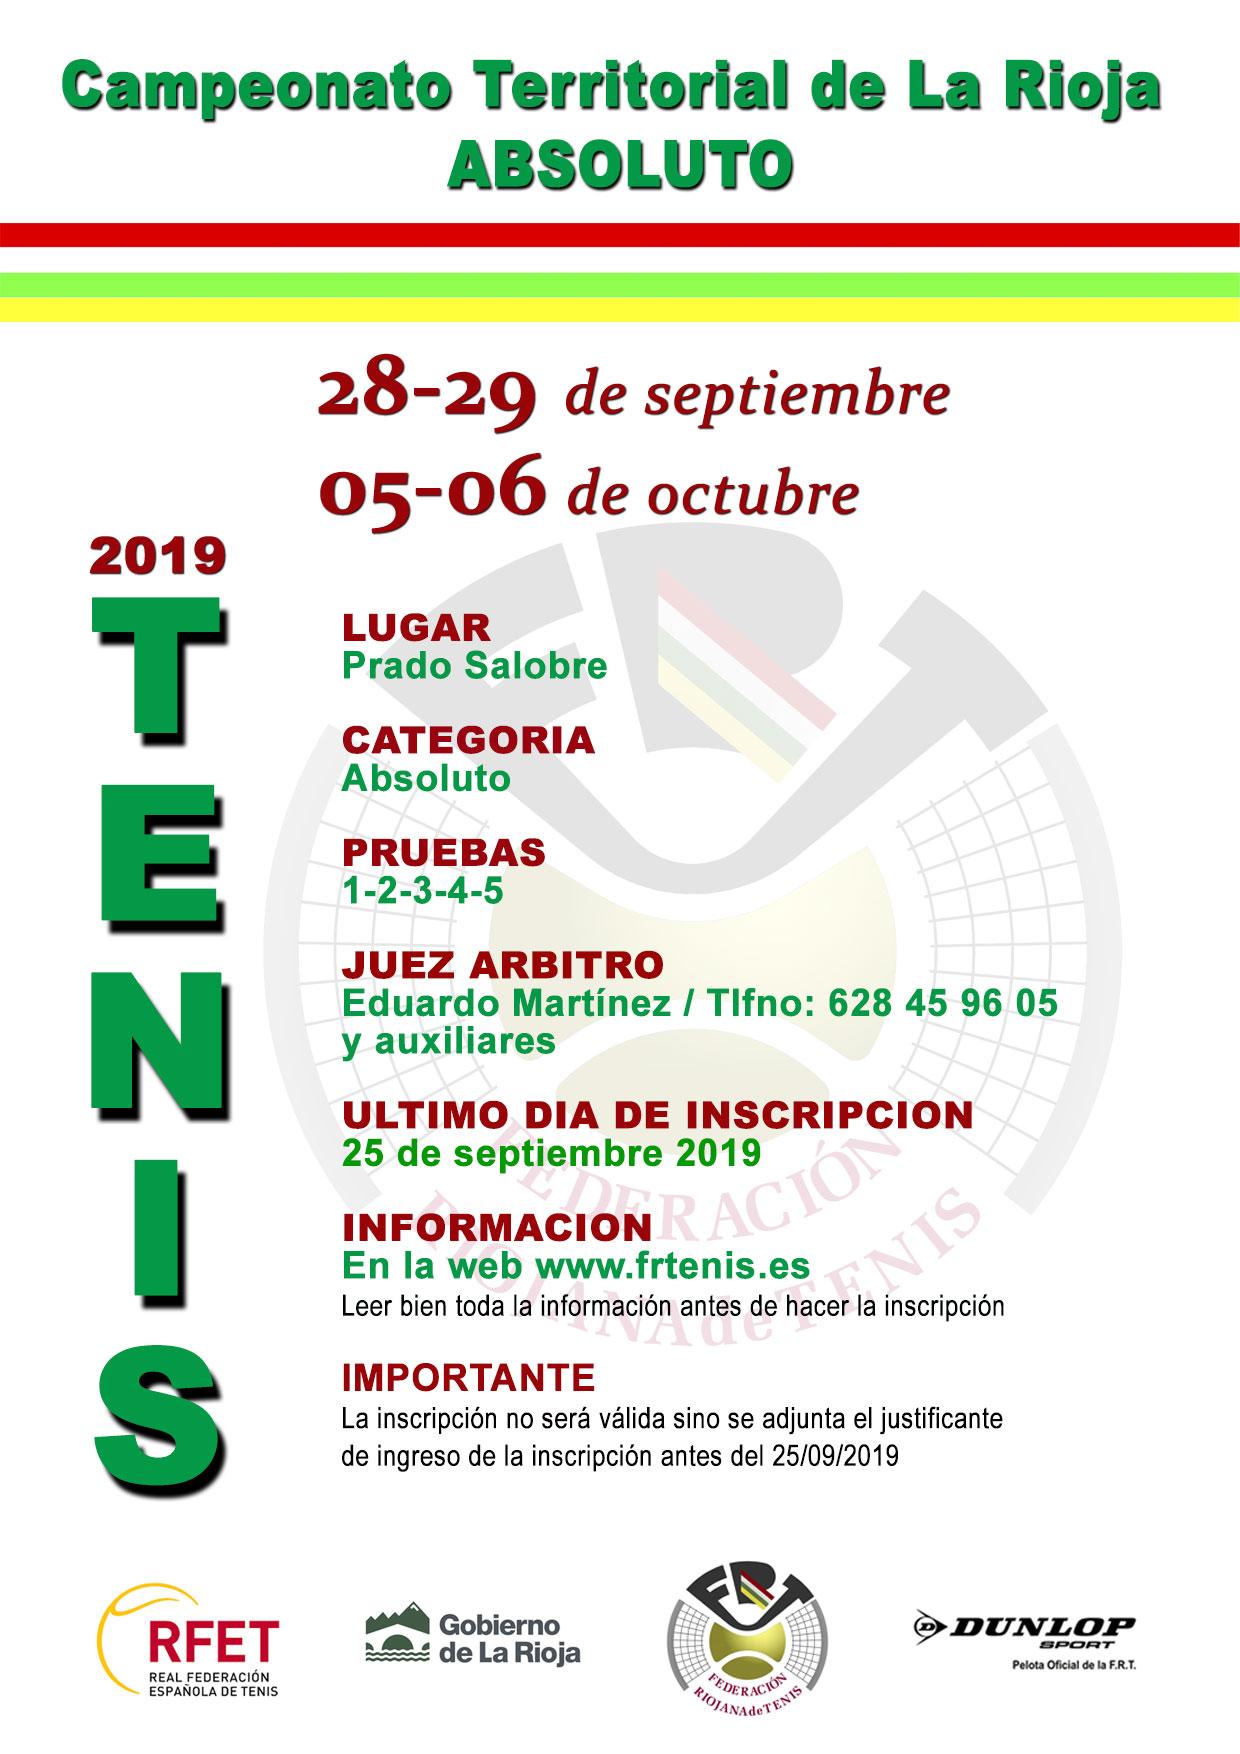 Campeonato Territorial de La Rioja Absoluto